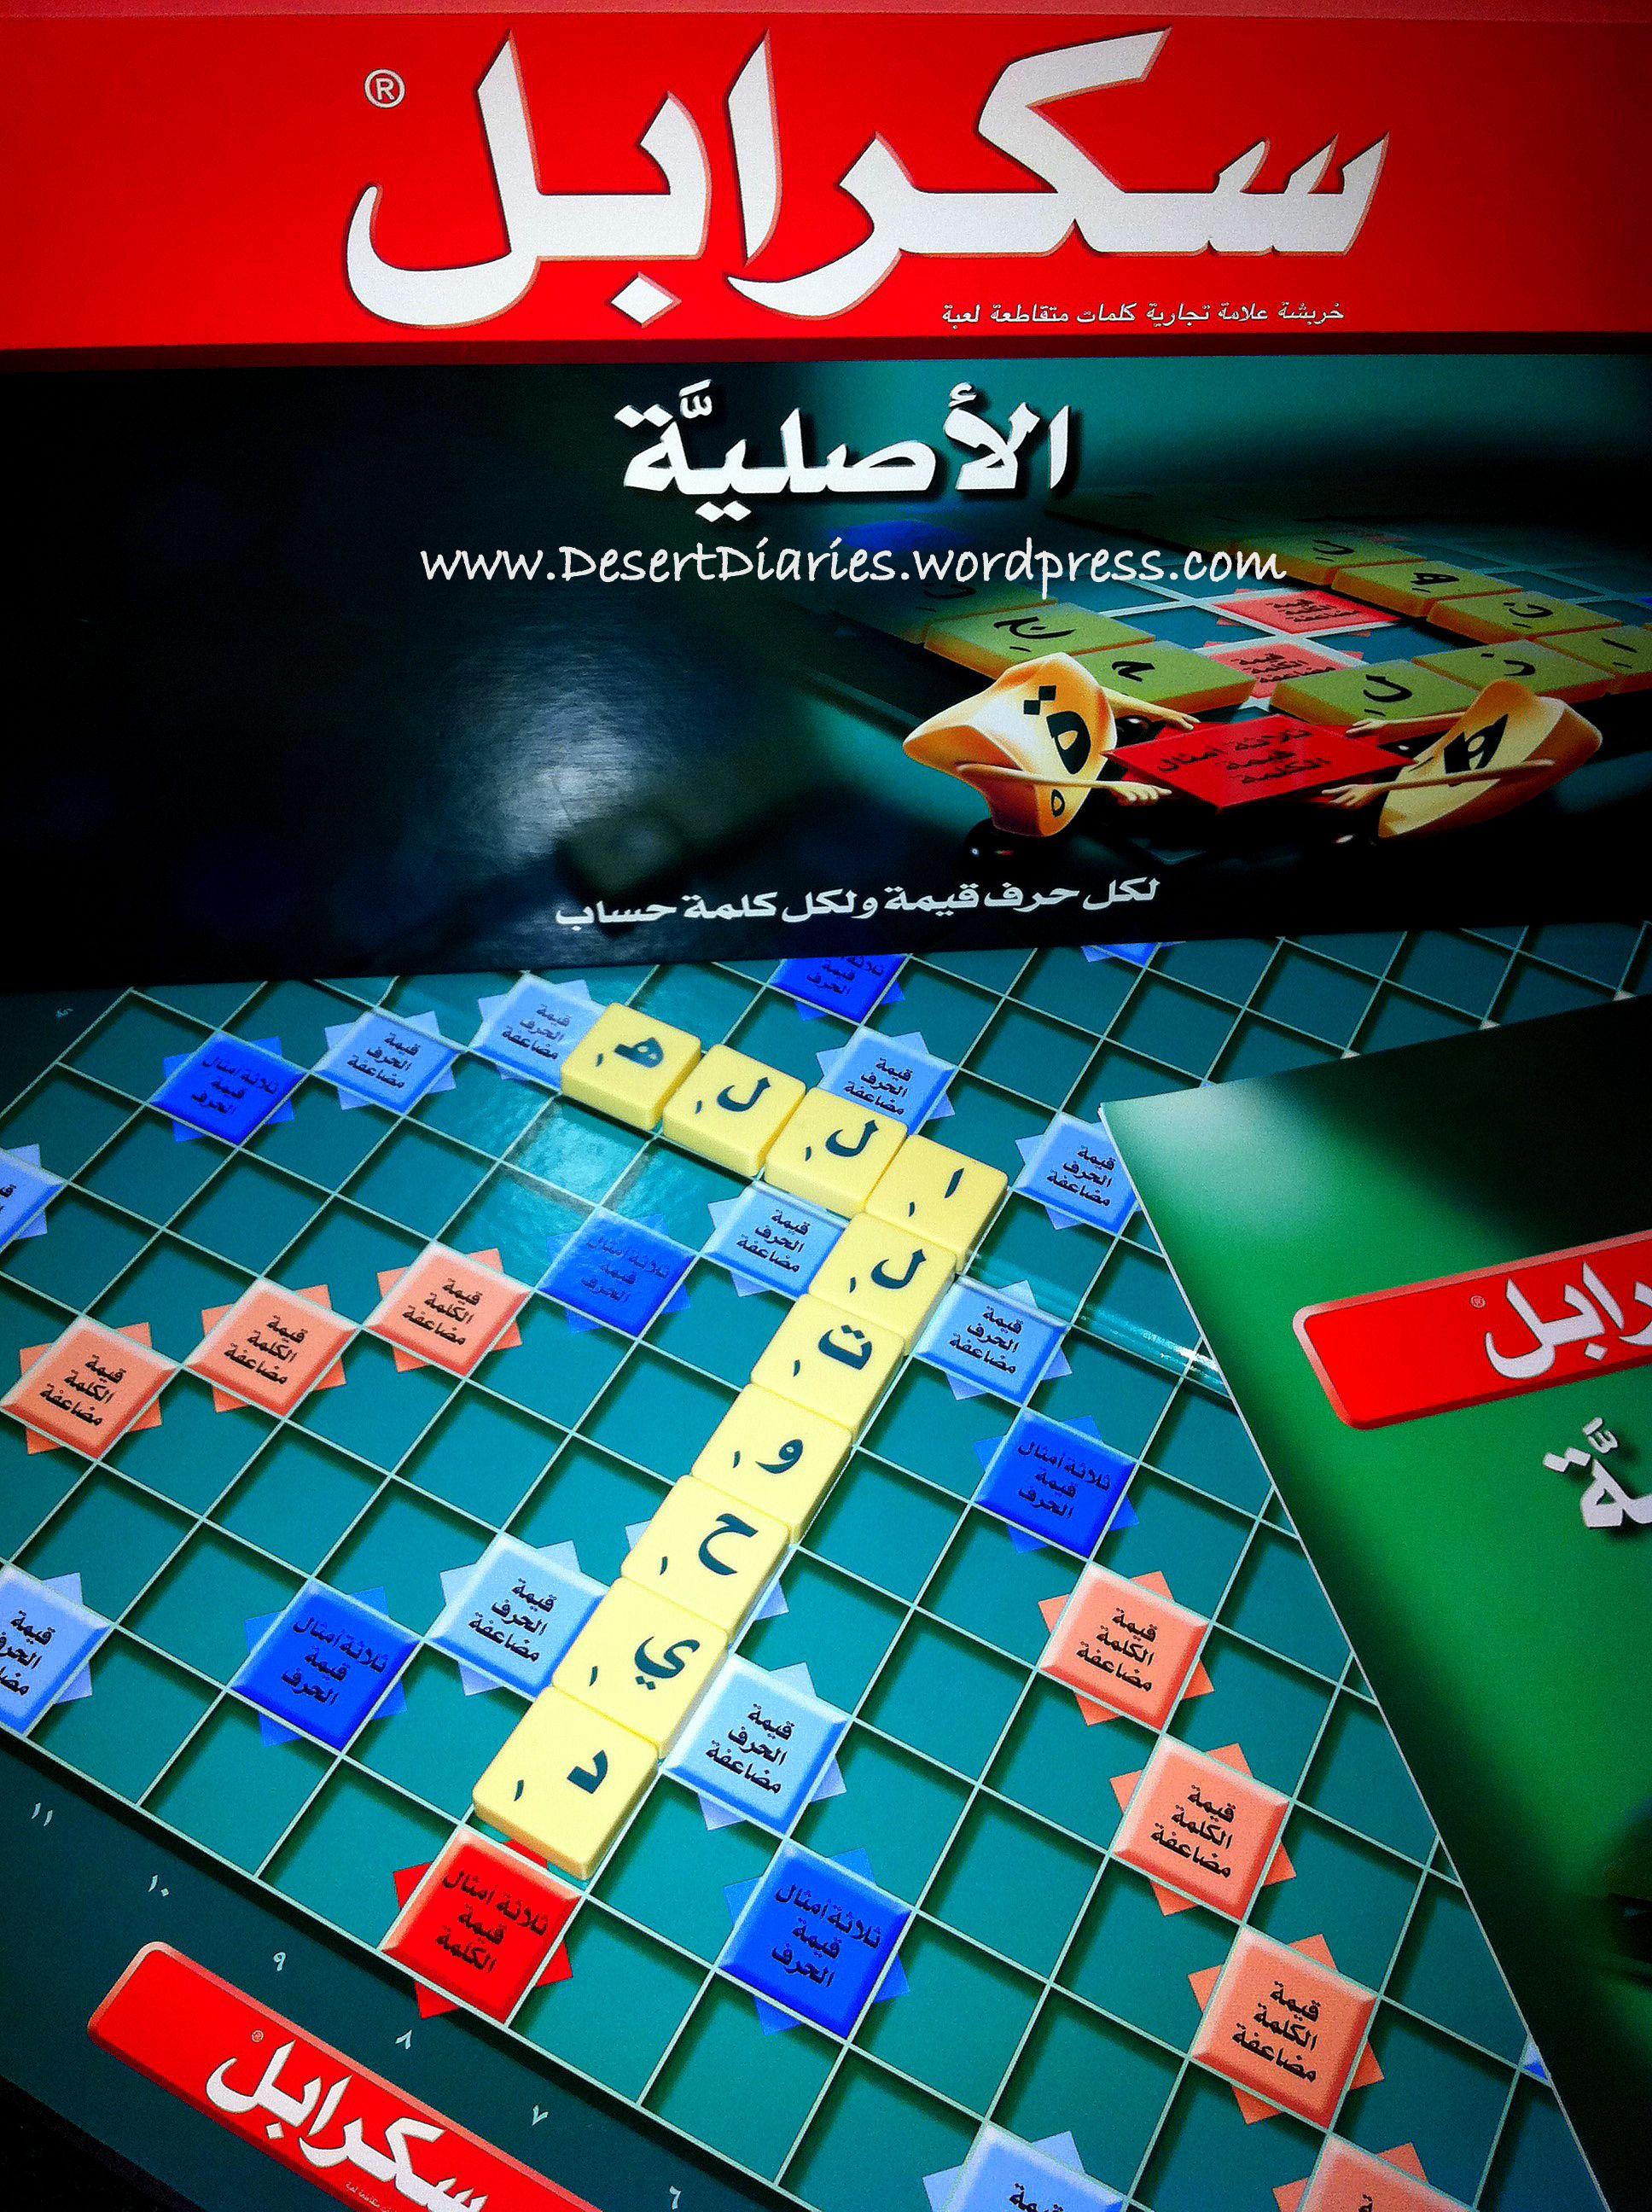 Scrabble The Arabic Version Scrabble Relatable Spatial